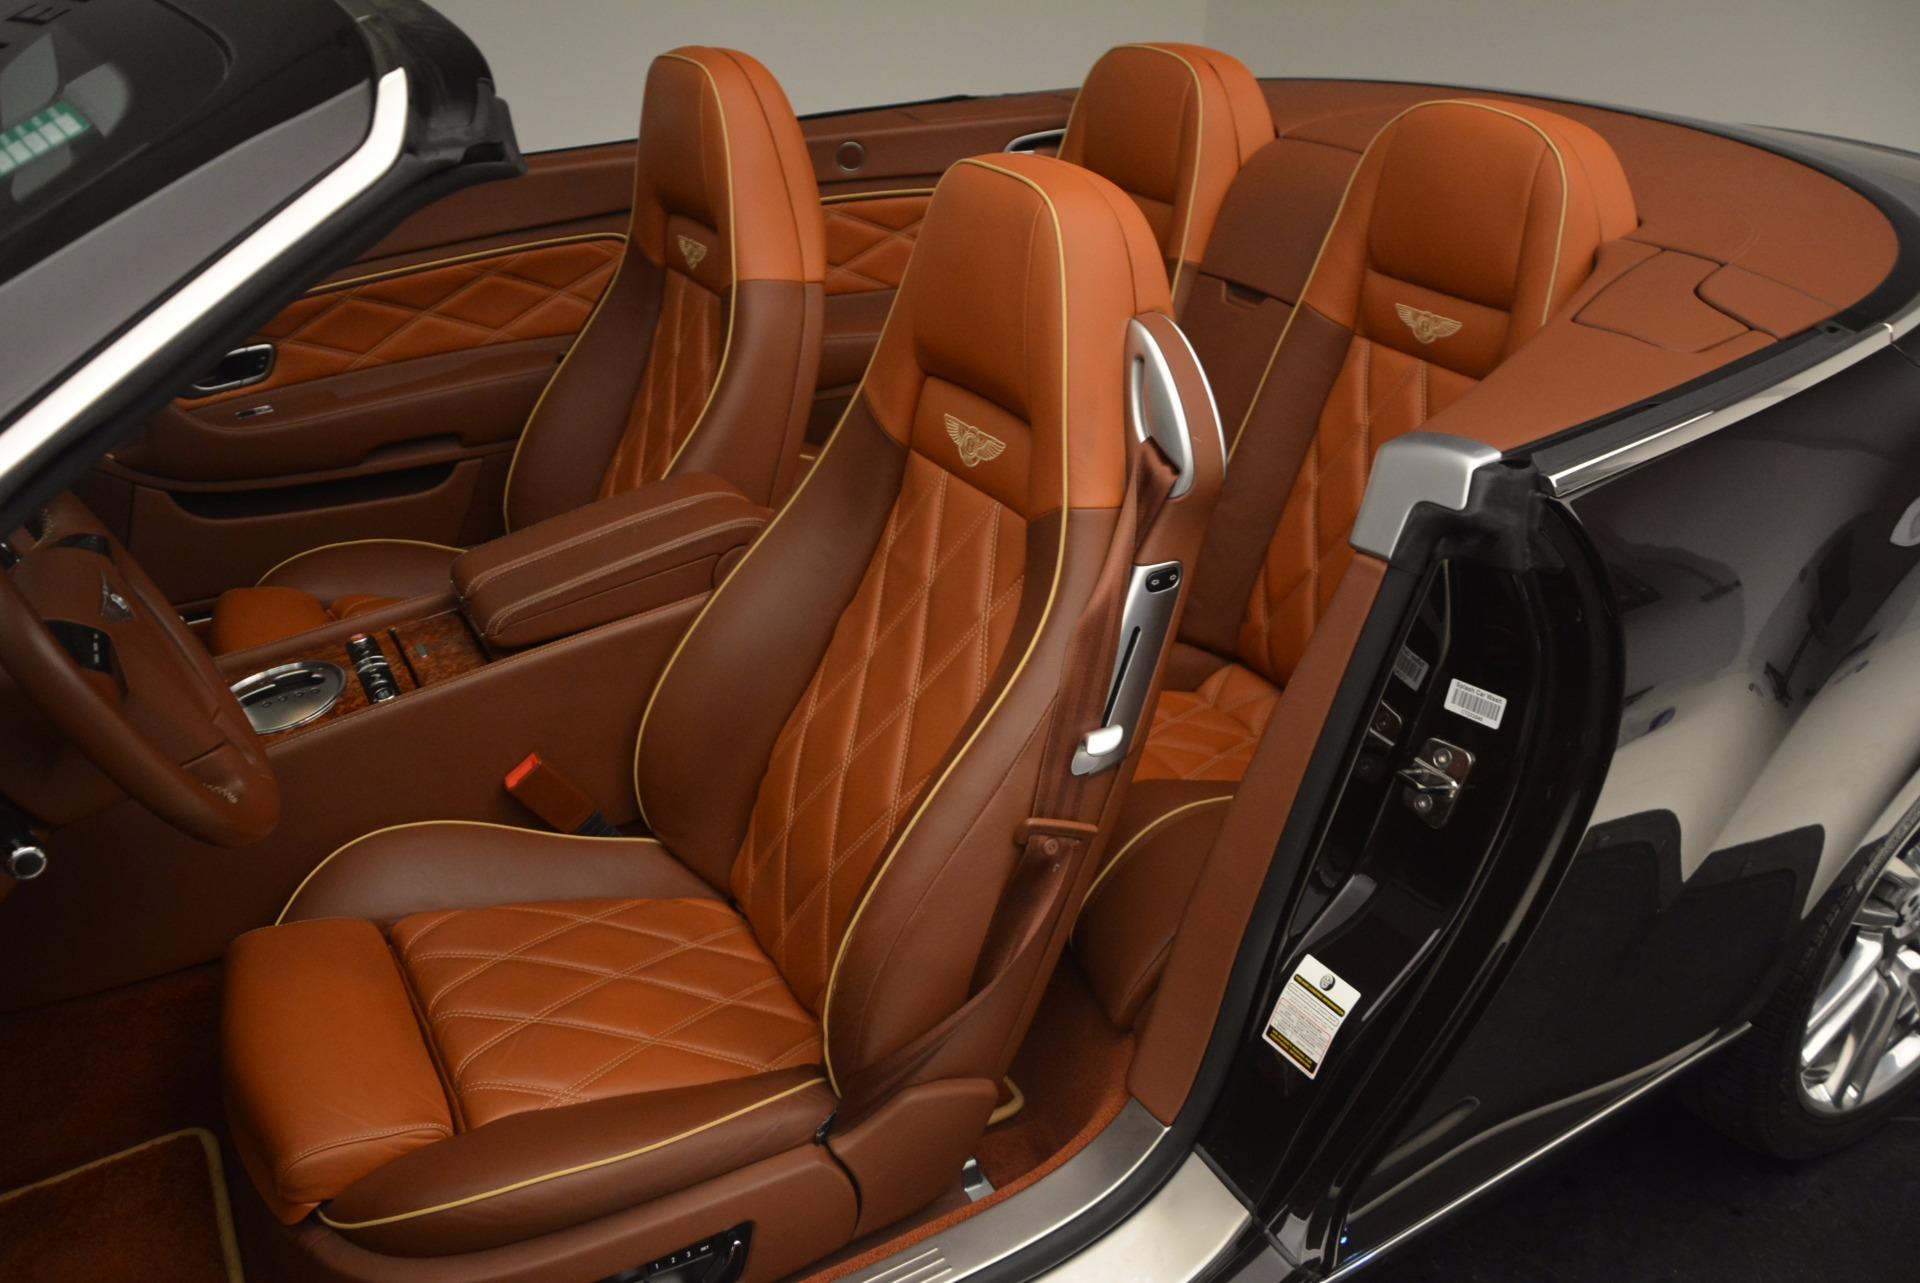 Used 2010 Bentley Continental GT Series 51 For Sale In Westport, CT 1222_p34